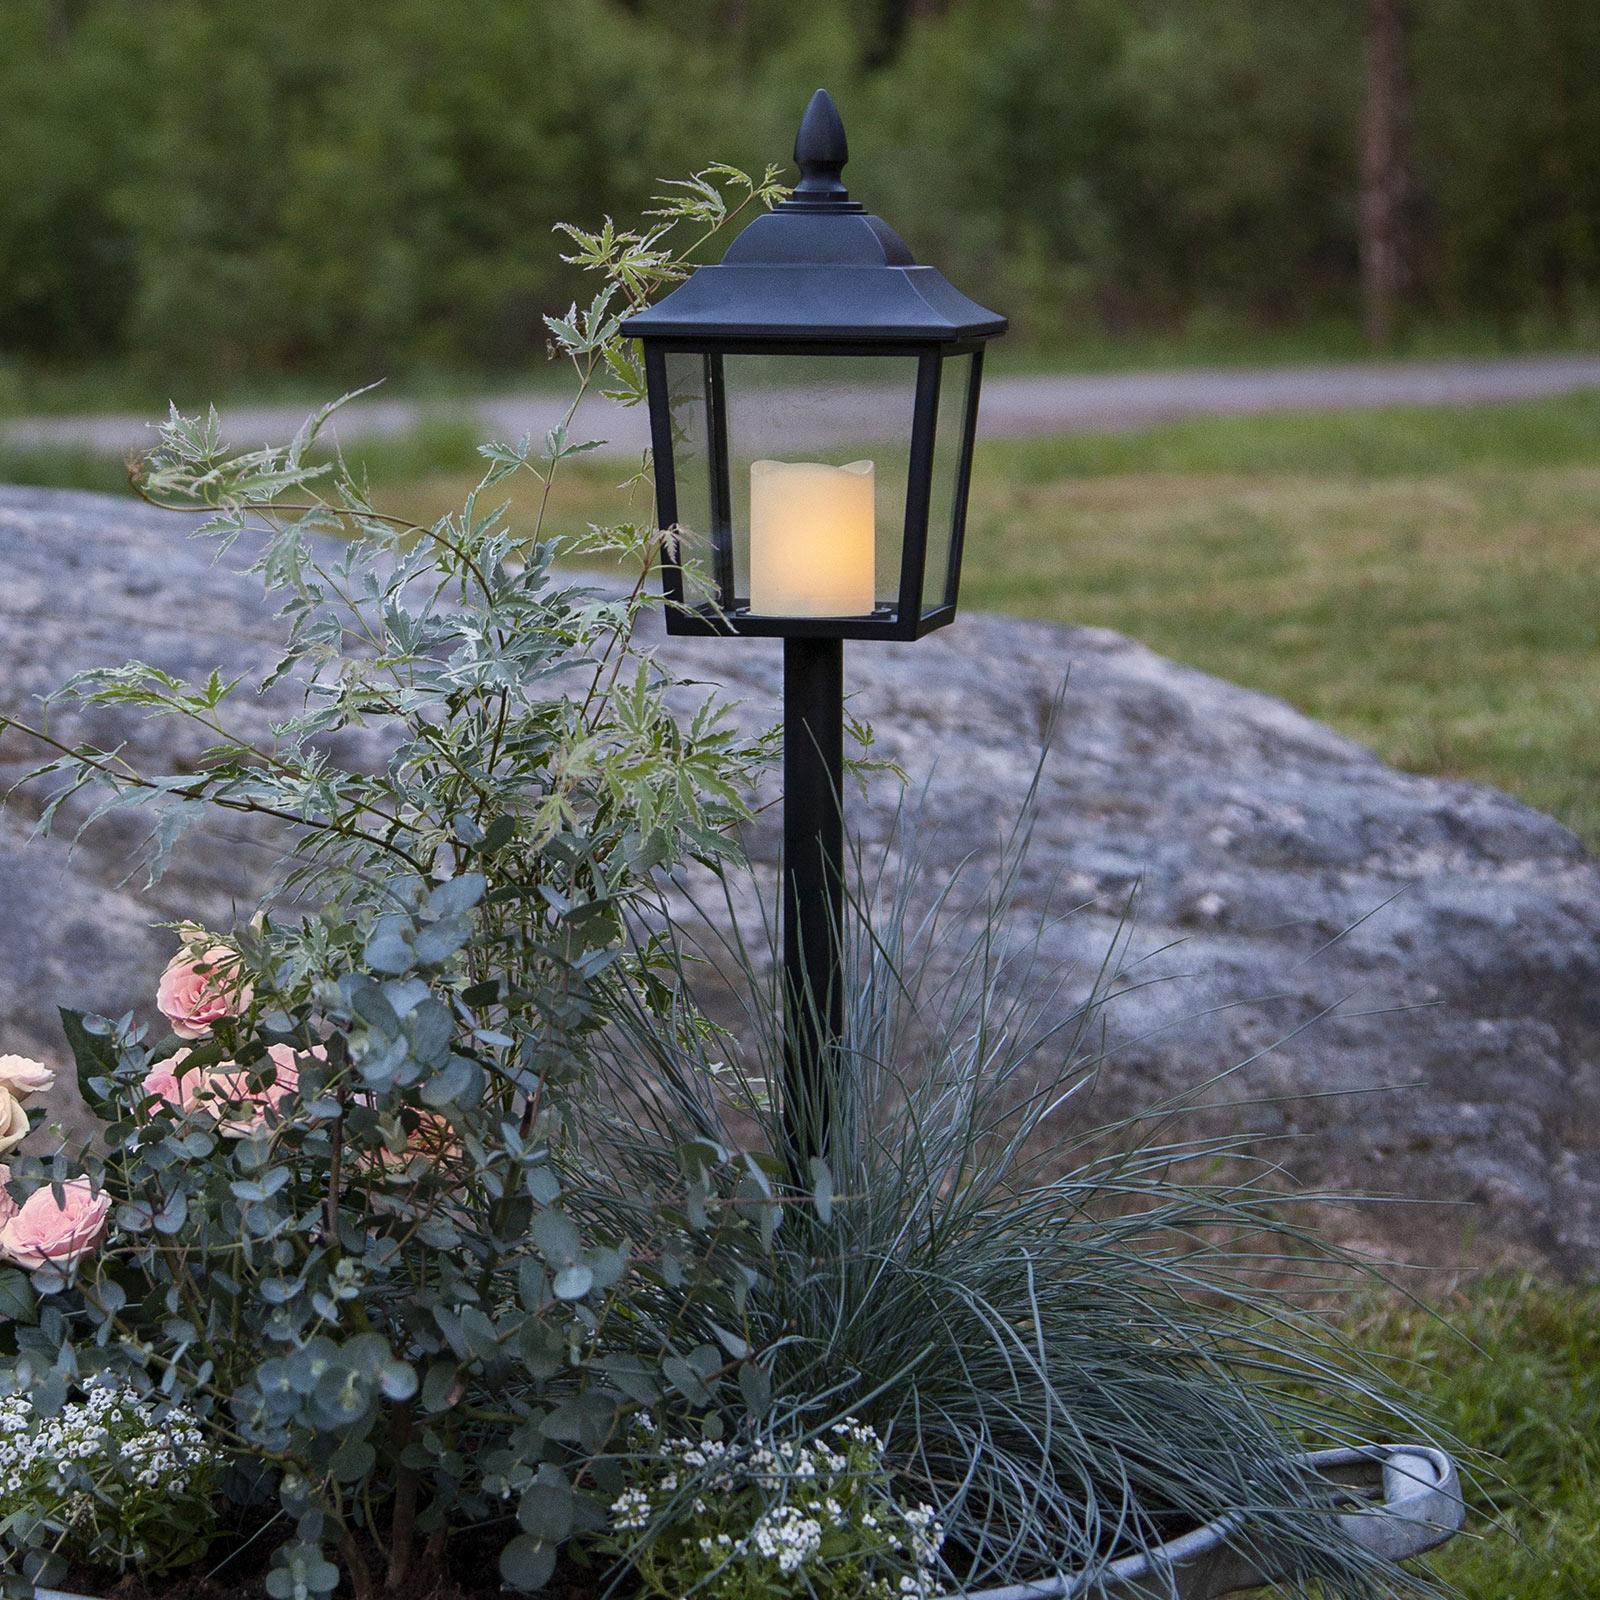 Lumino LED Flame Lantern, alto 52 cm